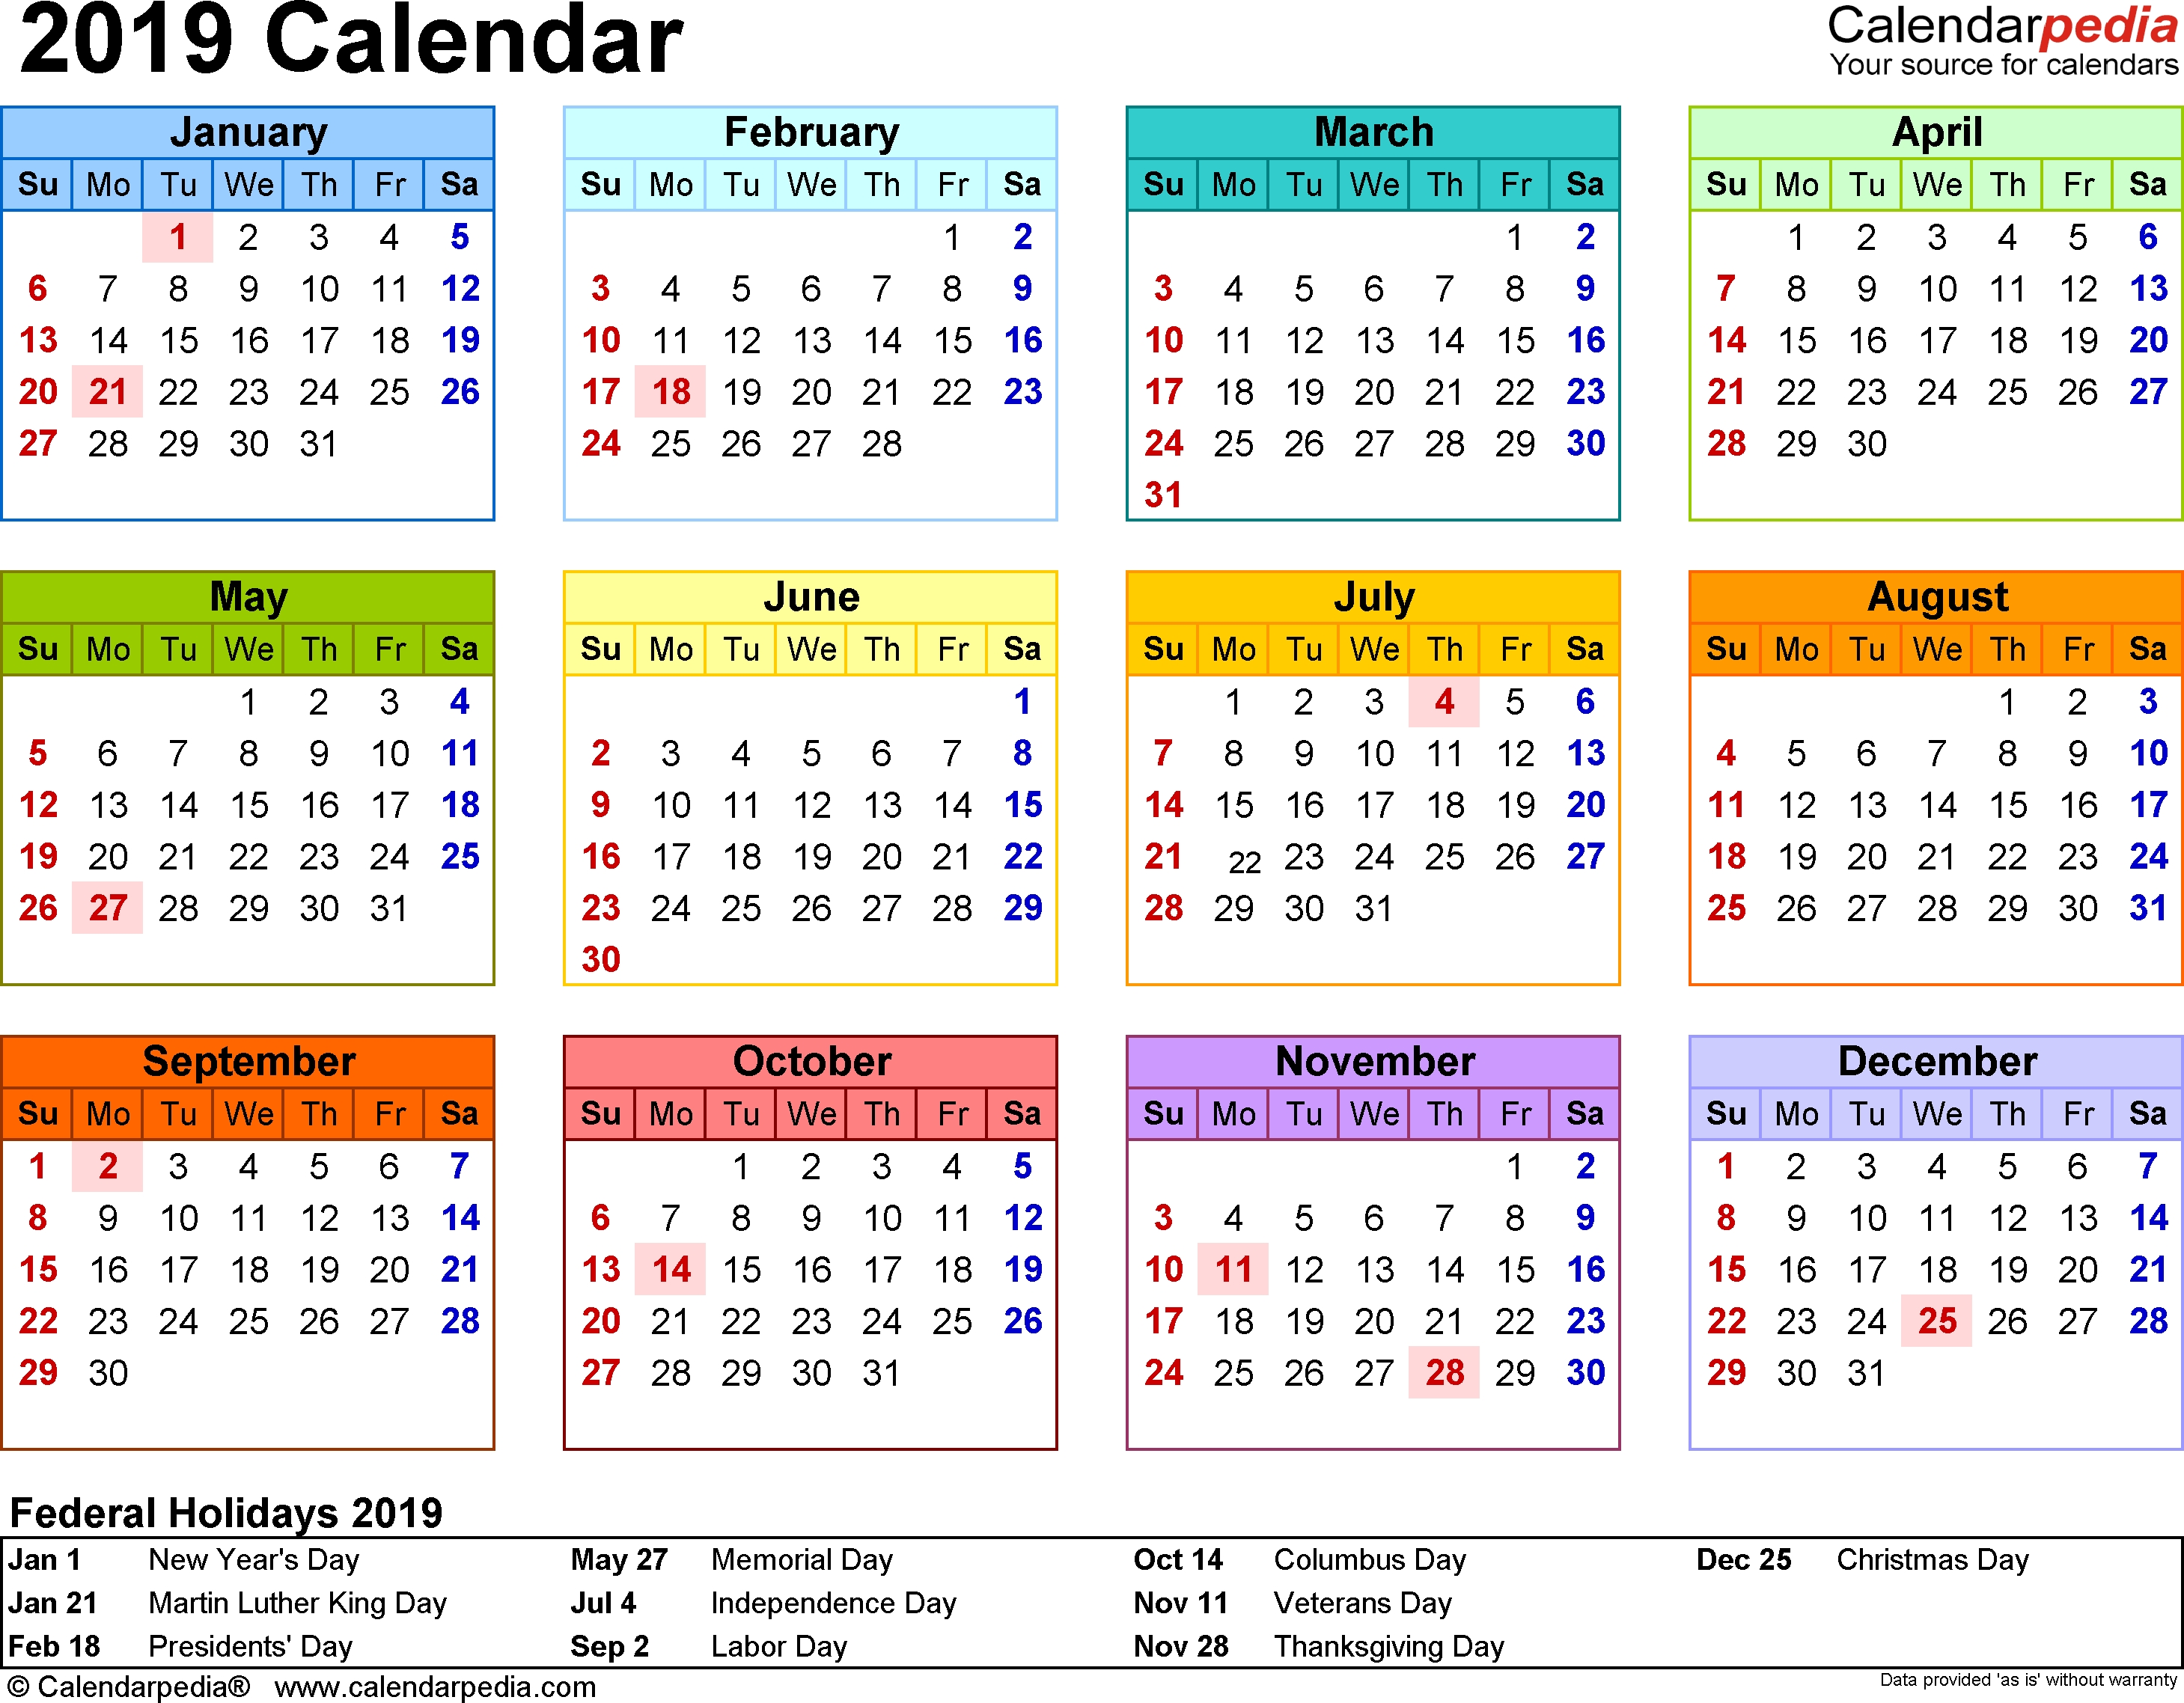 2019 Calendar One Page | Printable Calendar Template | Printable  1 Page 9 Month Calendar